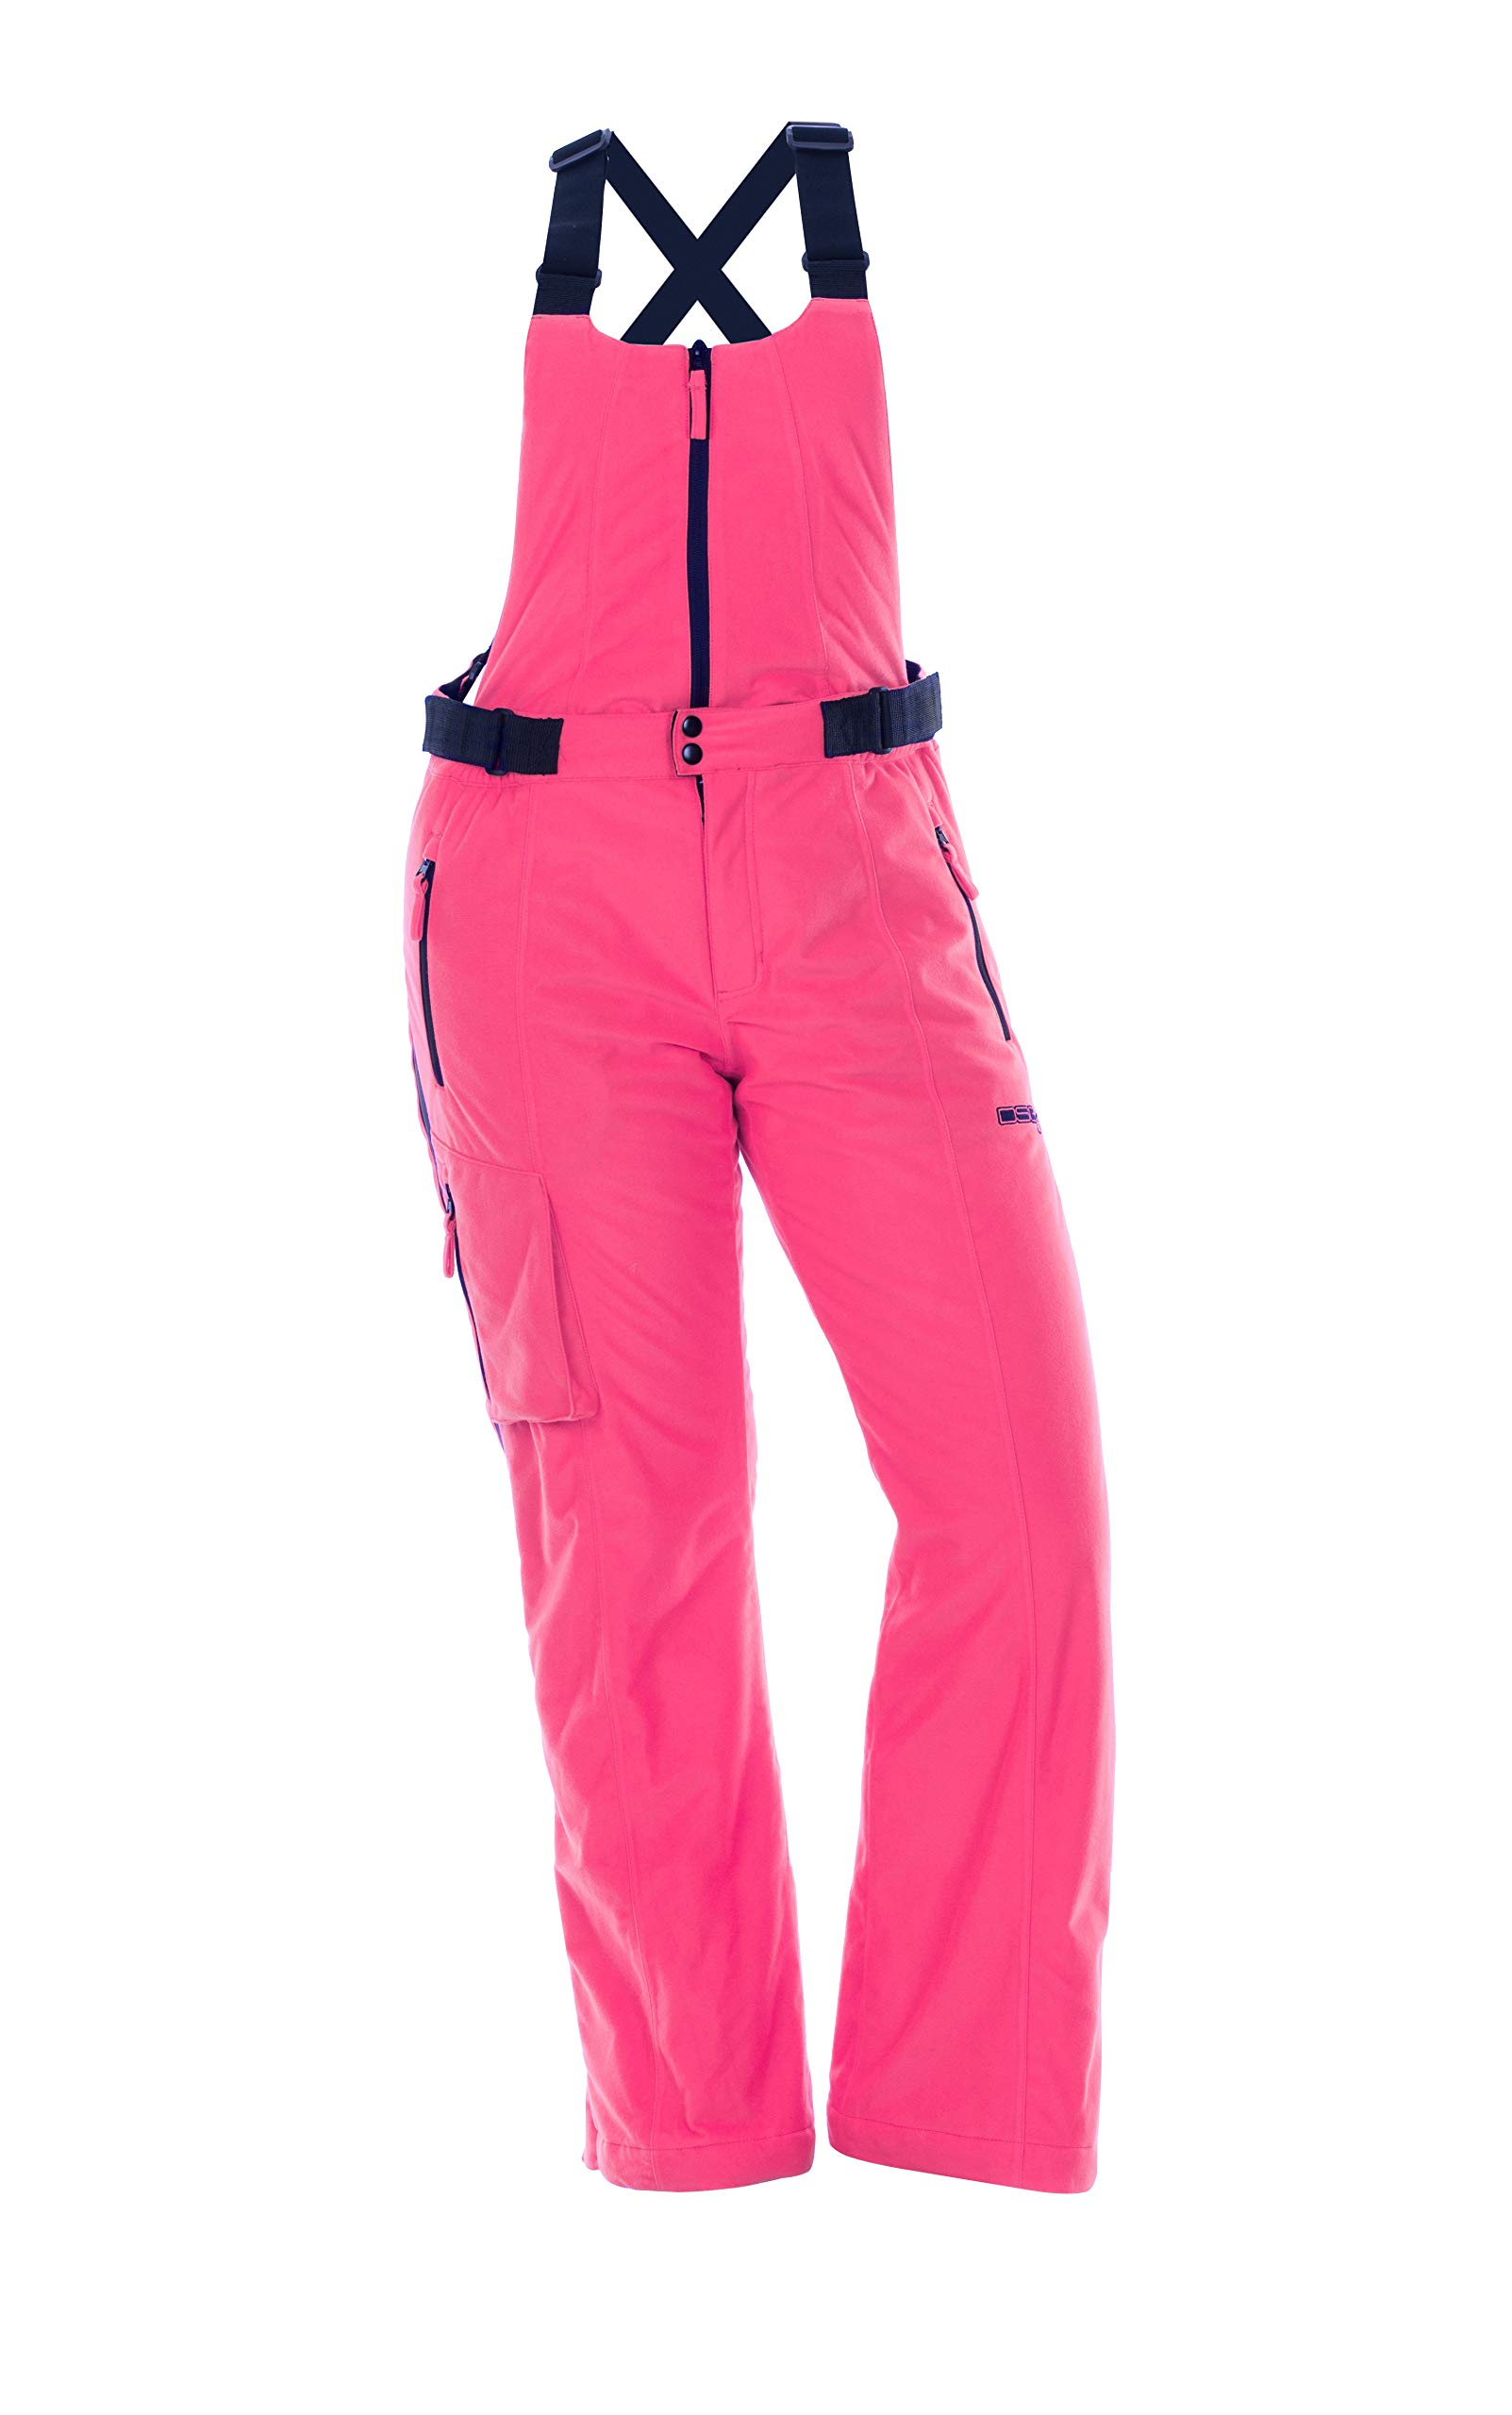 DSG Outerwear Women's Hunting Kylie 3.0 Drop-Seat Bib (Blaze Pink, 3XL) by DSG Outerwear